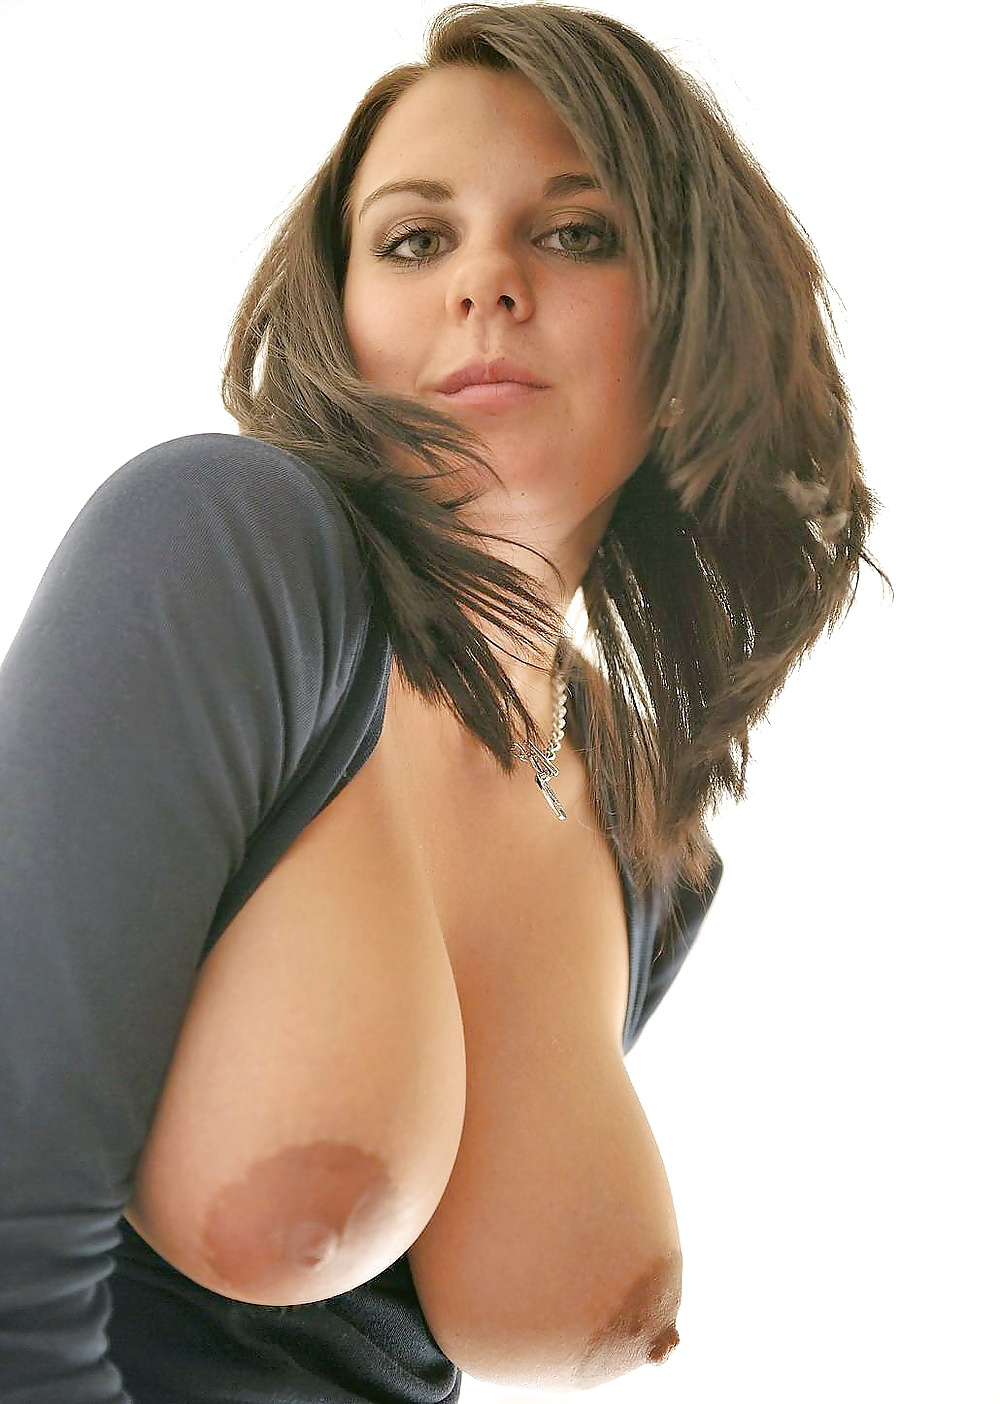 ftv-girl-big-boobs-d